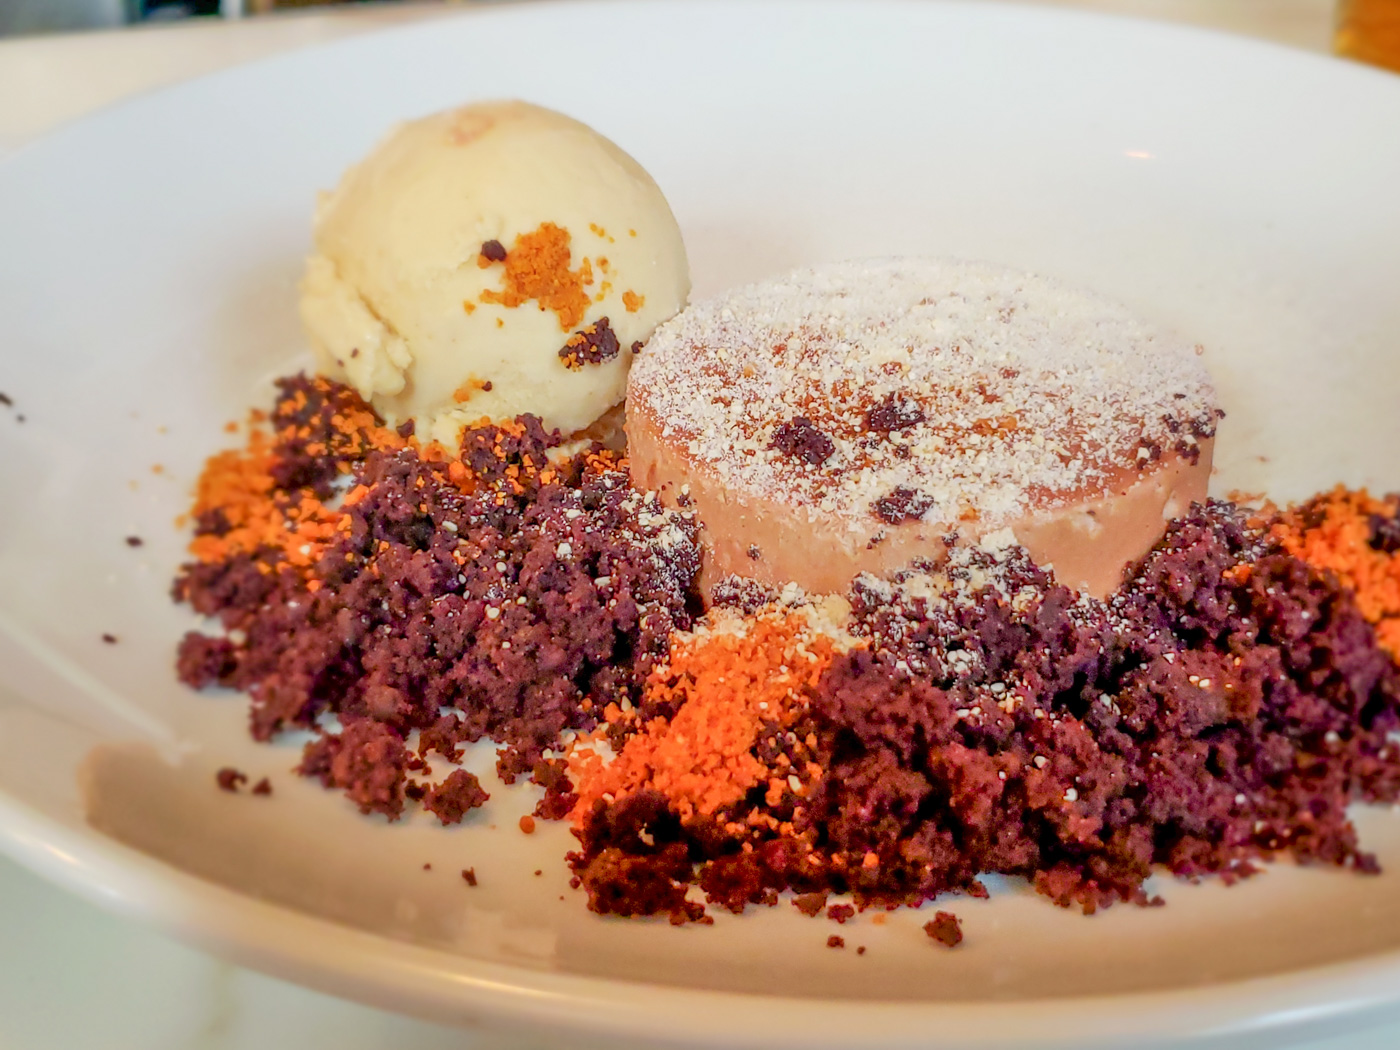 Chocolate Dessert at Rex1516